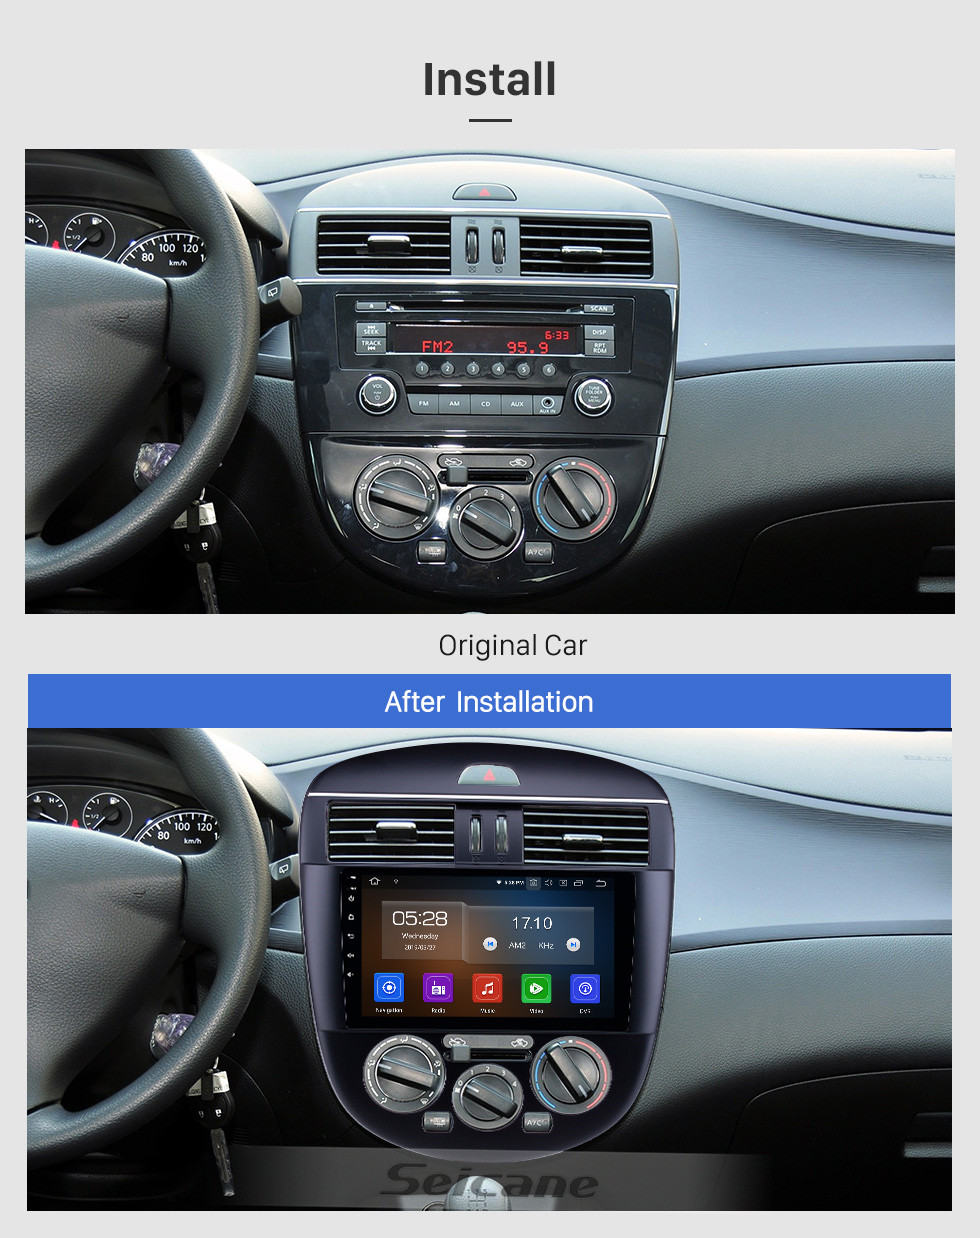 Seicane 2011-2014 Nissan Tiida Manual A/C Low Version Android 10.0 9 inch GPS Navigation Radio Bluetooth HD Touchscreen USB Carplay support TPMS DAB+ 1080P